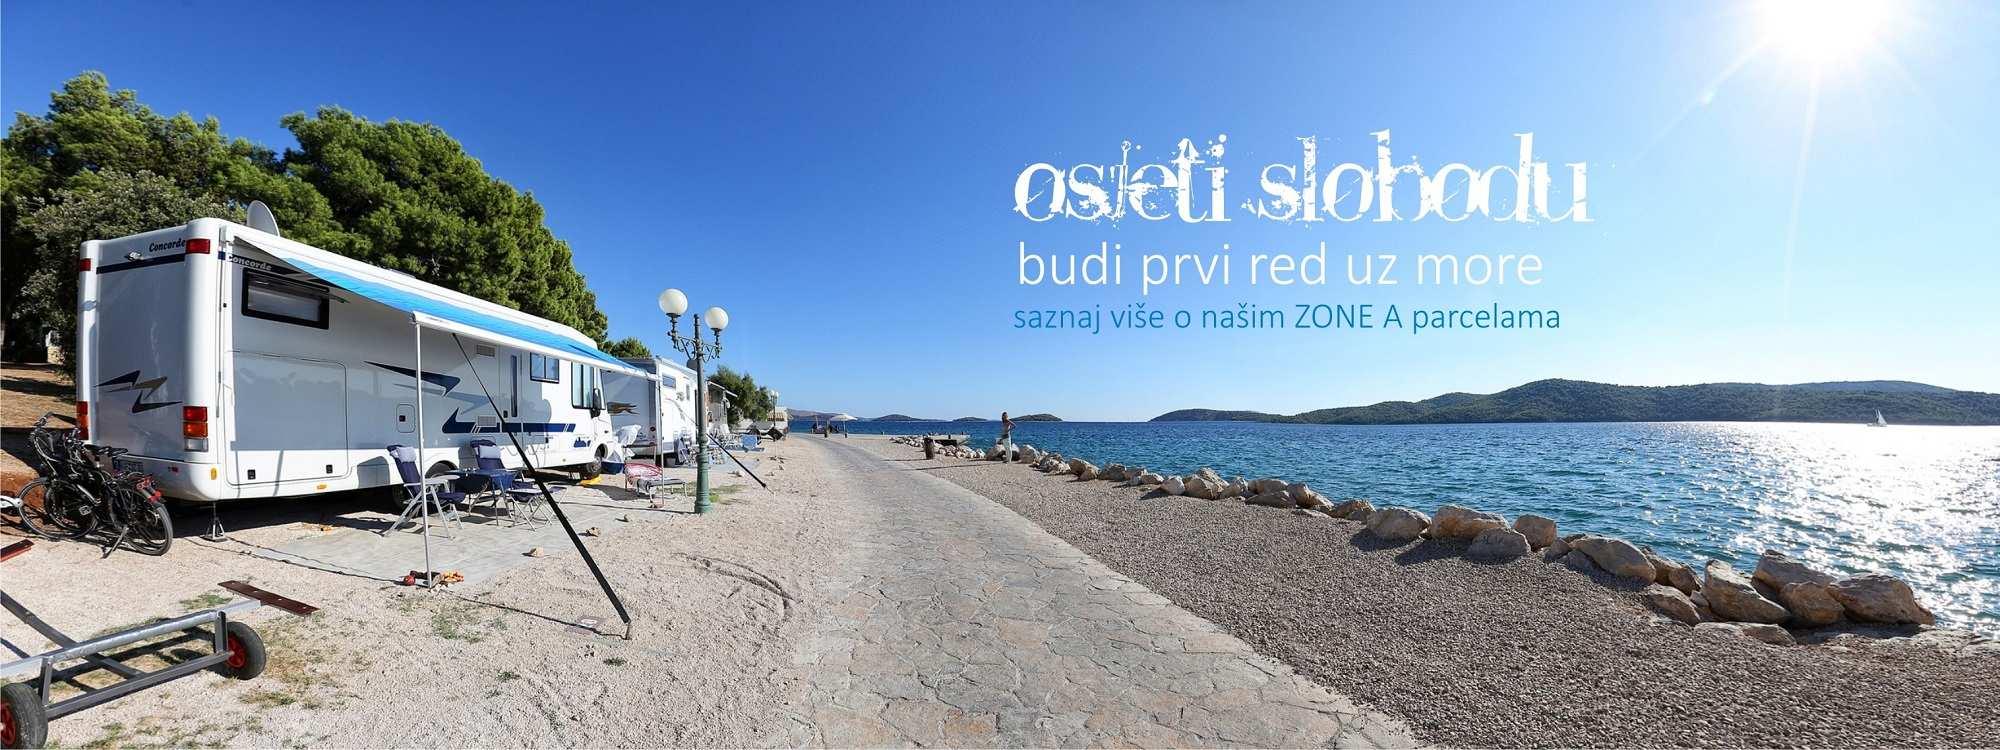 Solaris_camping_beach_resort_hrvatska_prvi_red_uz_more_parcela_zona_a